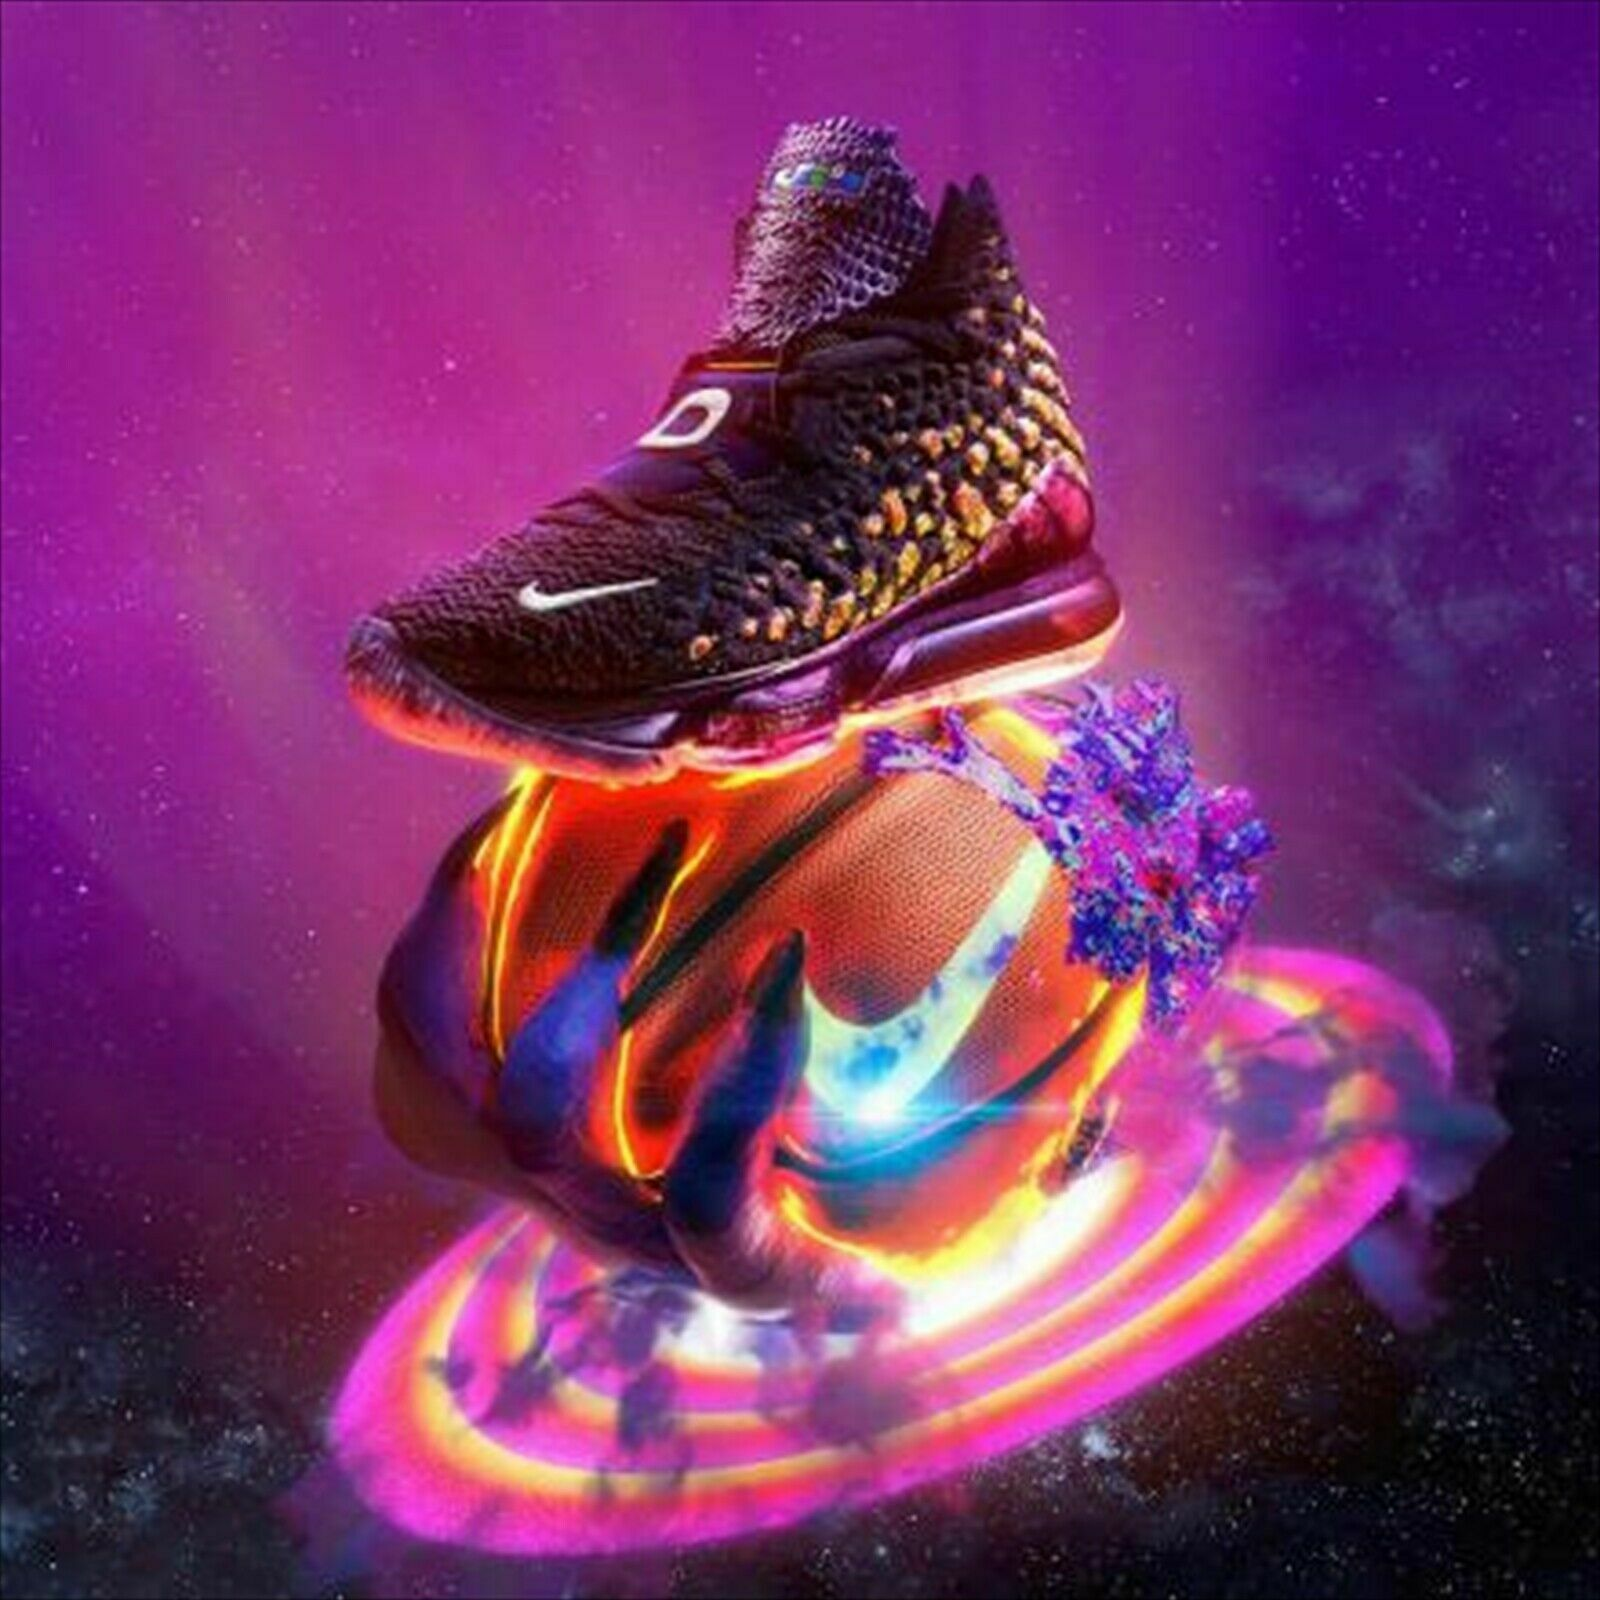 Nike Lebron 17 Xvii Monstars Space Jam Basketball Shoes Gym Cd5050-400 Size 7